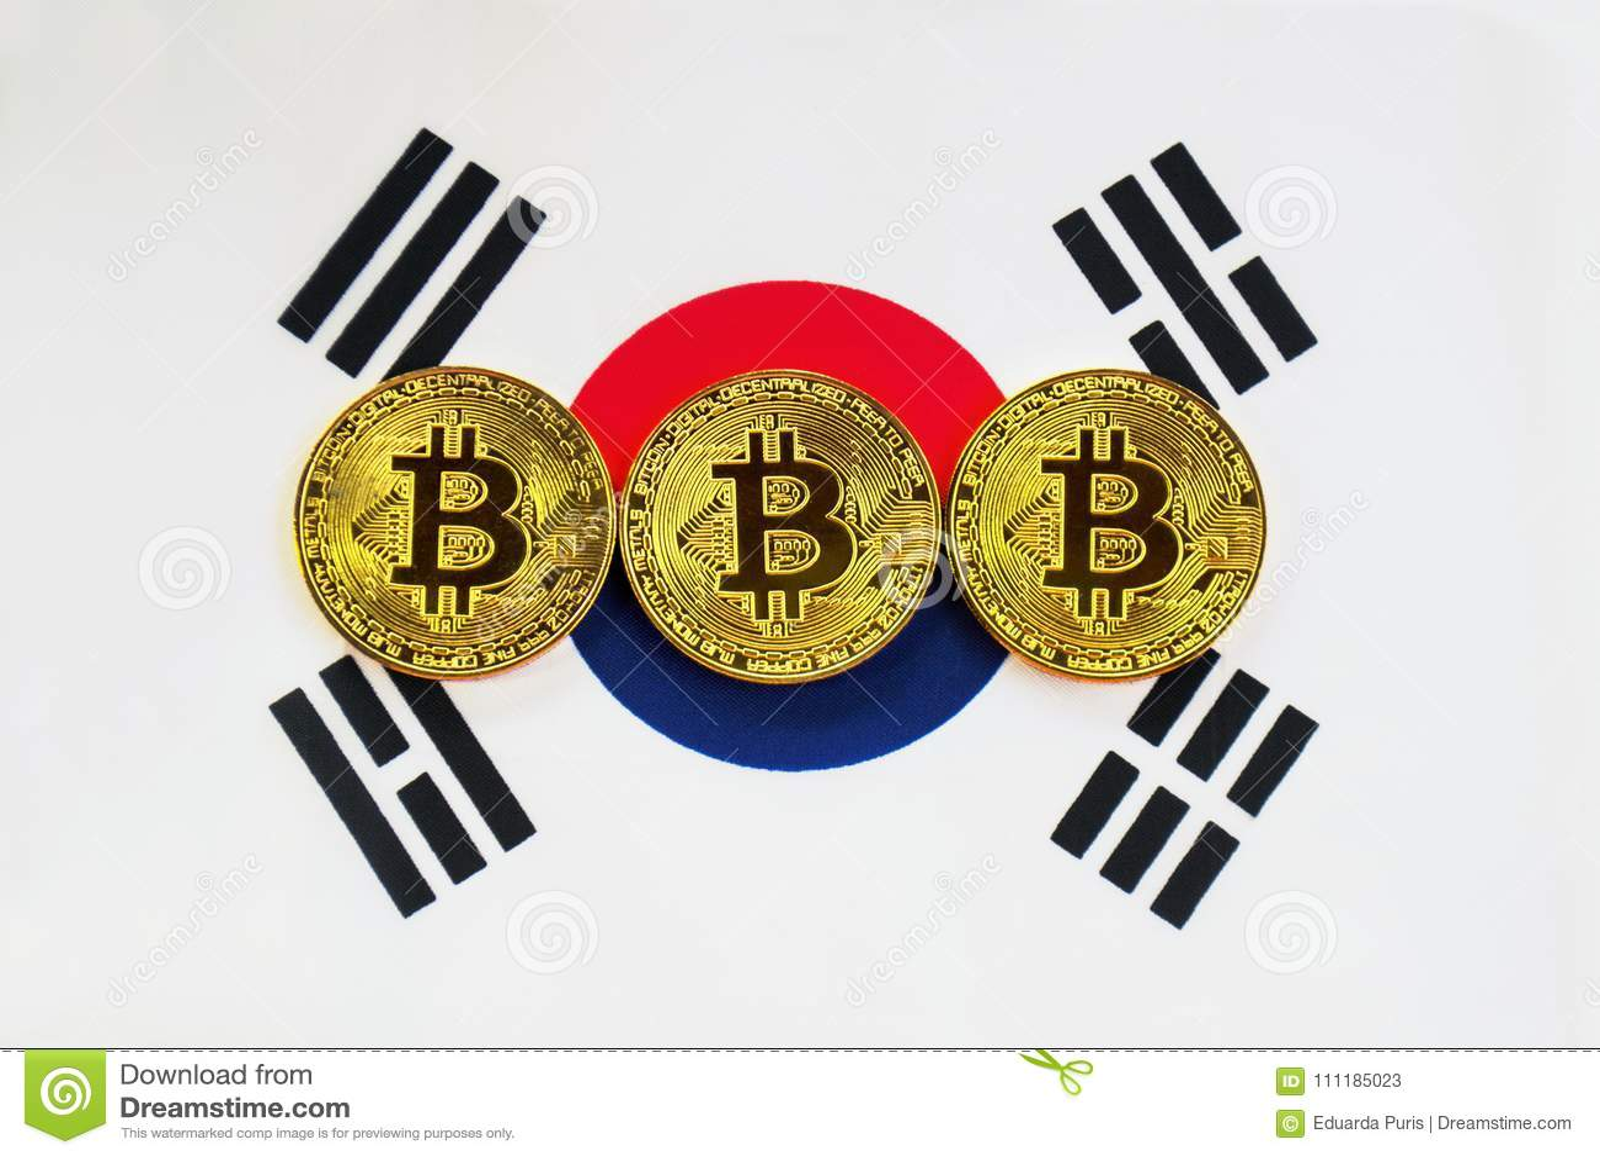 Bitcoin on the Background South Korea Flag